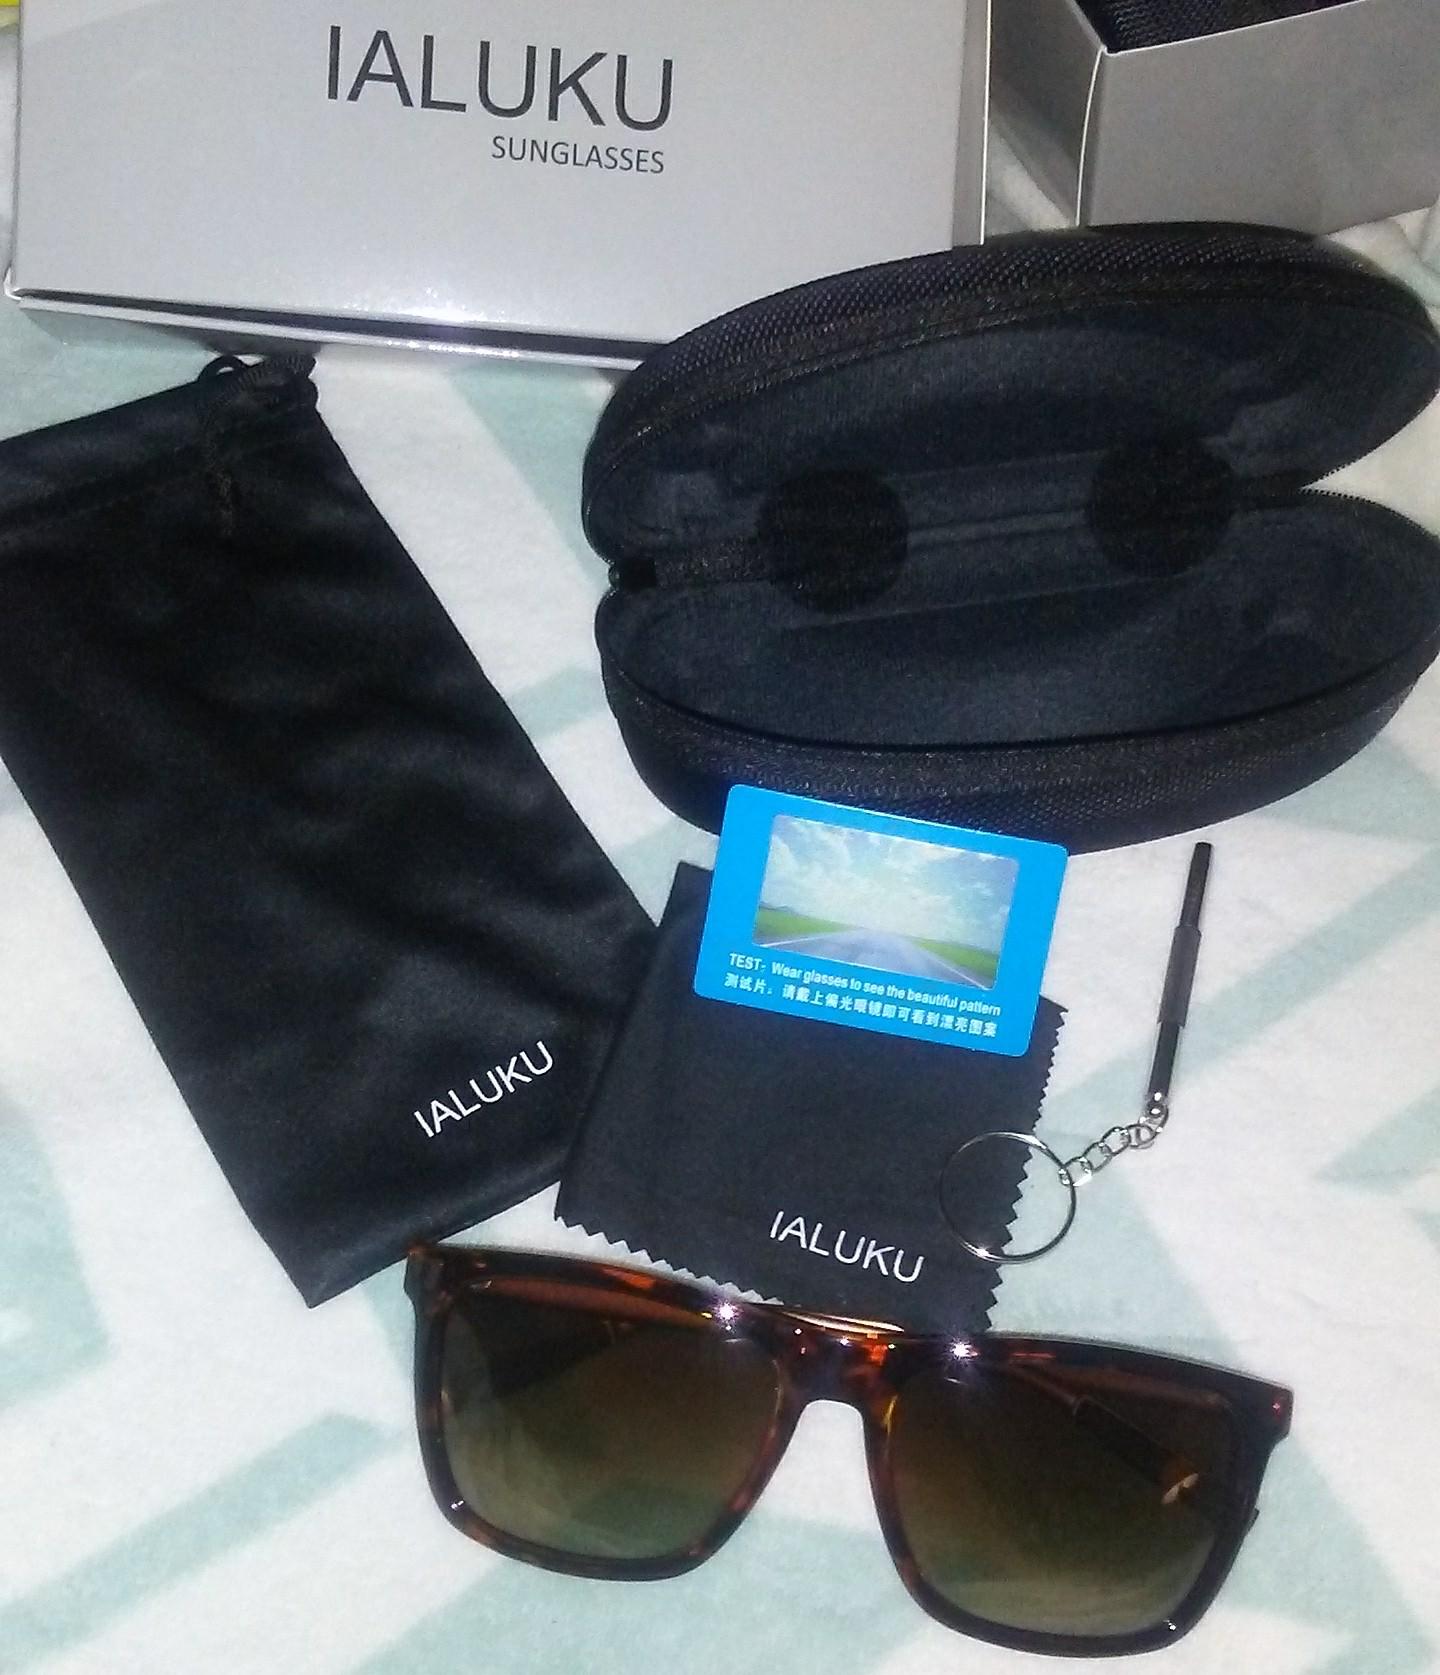 Awesome Fashionable Sunglasses